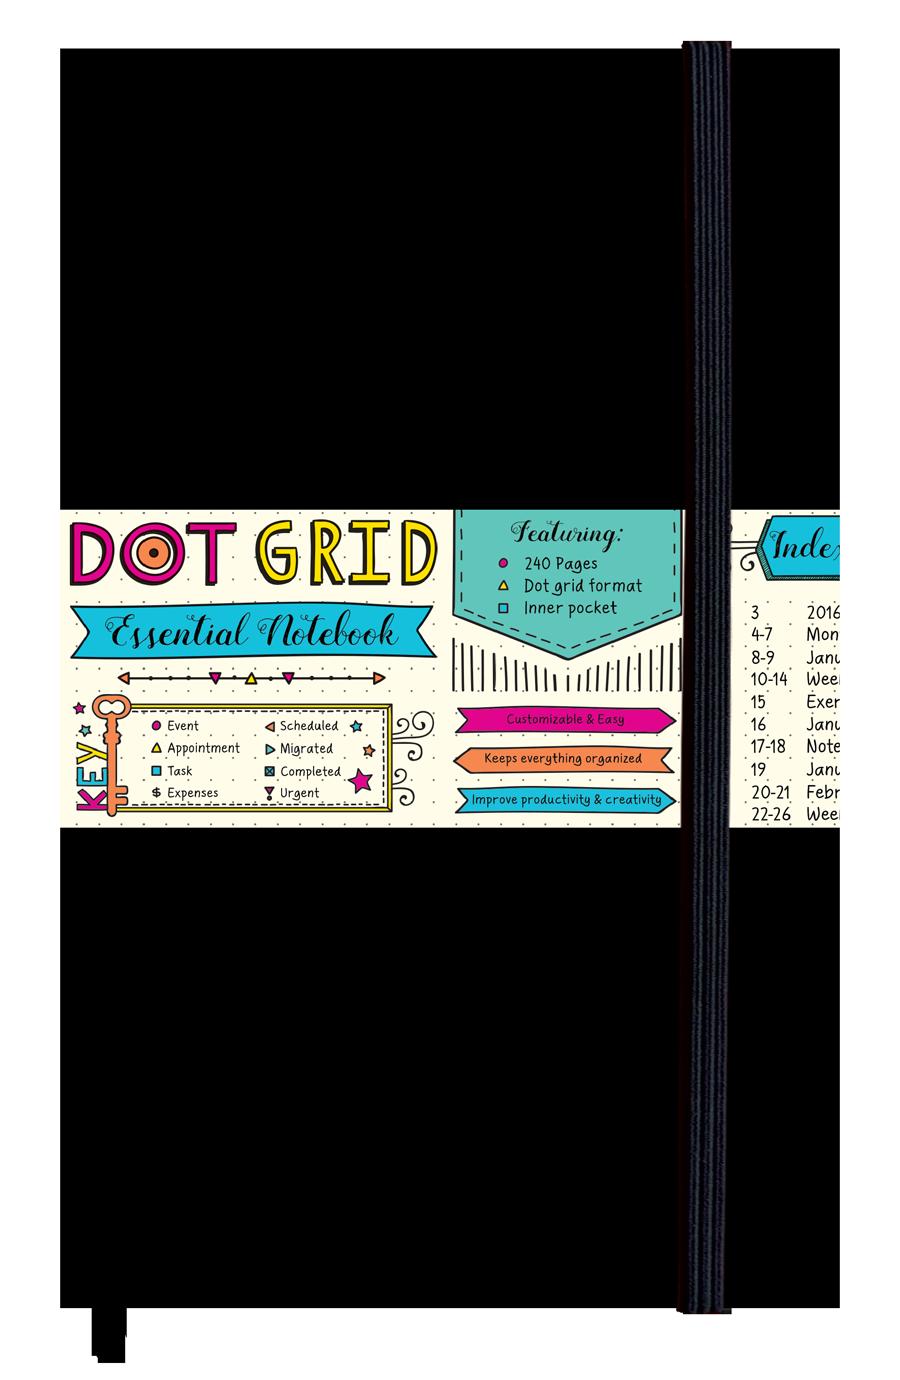 Dot Grid Essential Notebook